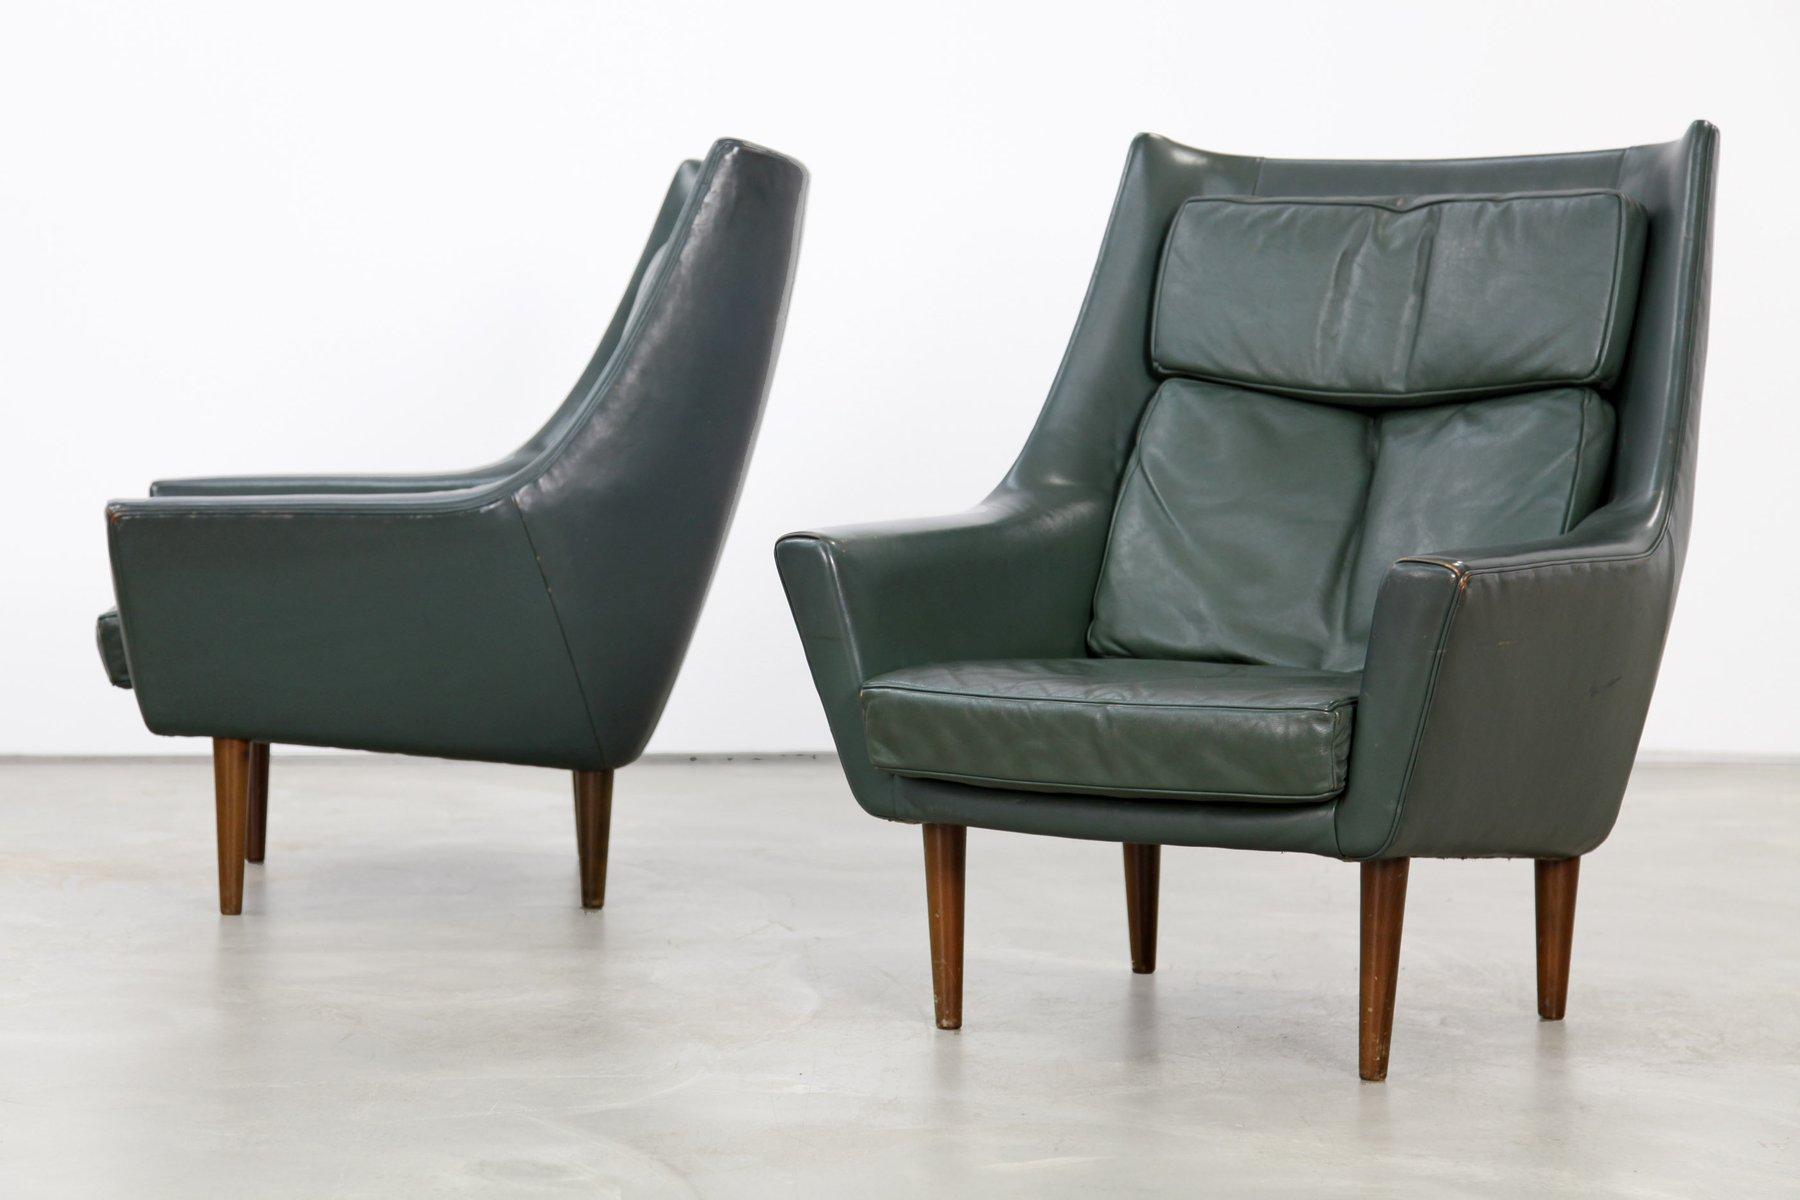 Vintage Danish Dark Green Leather Lounge Chairs, Set Of 2